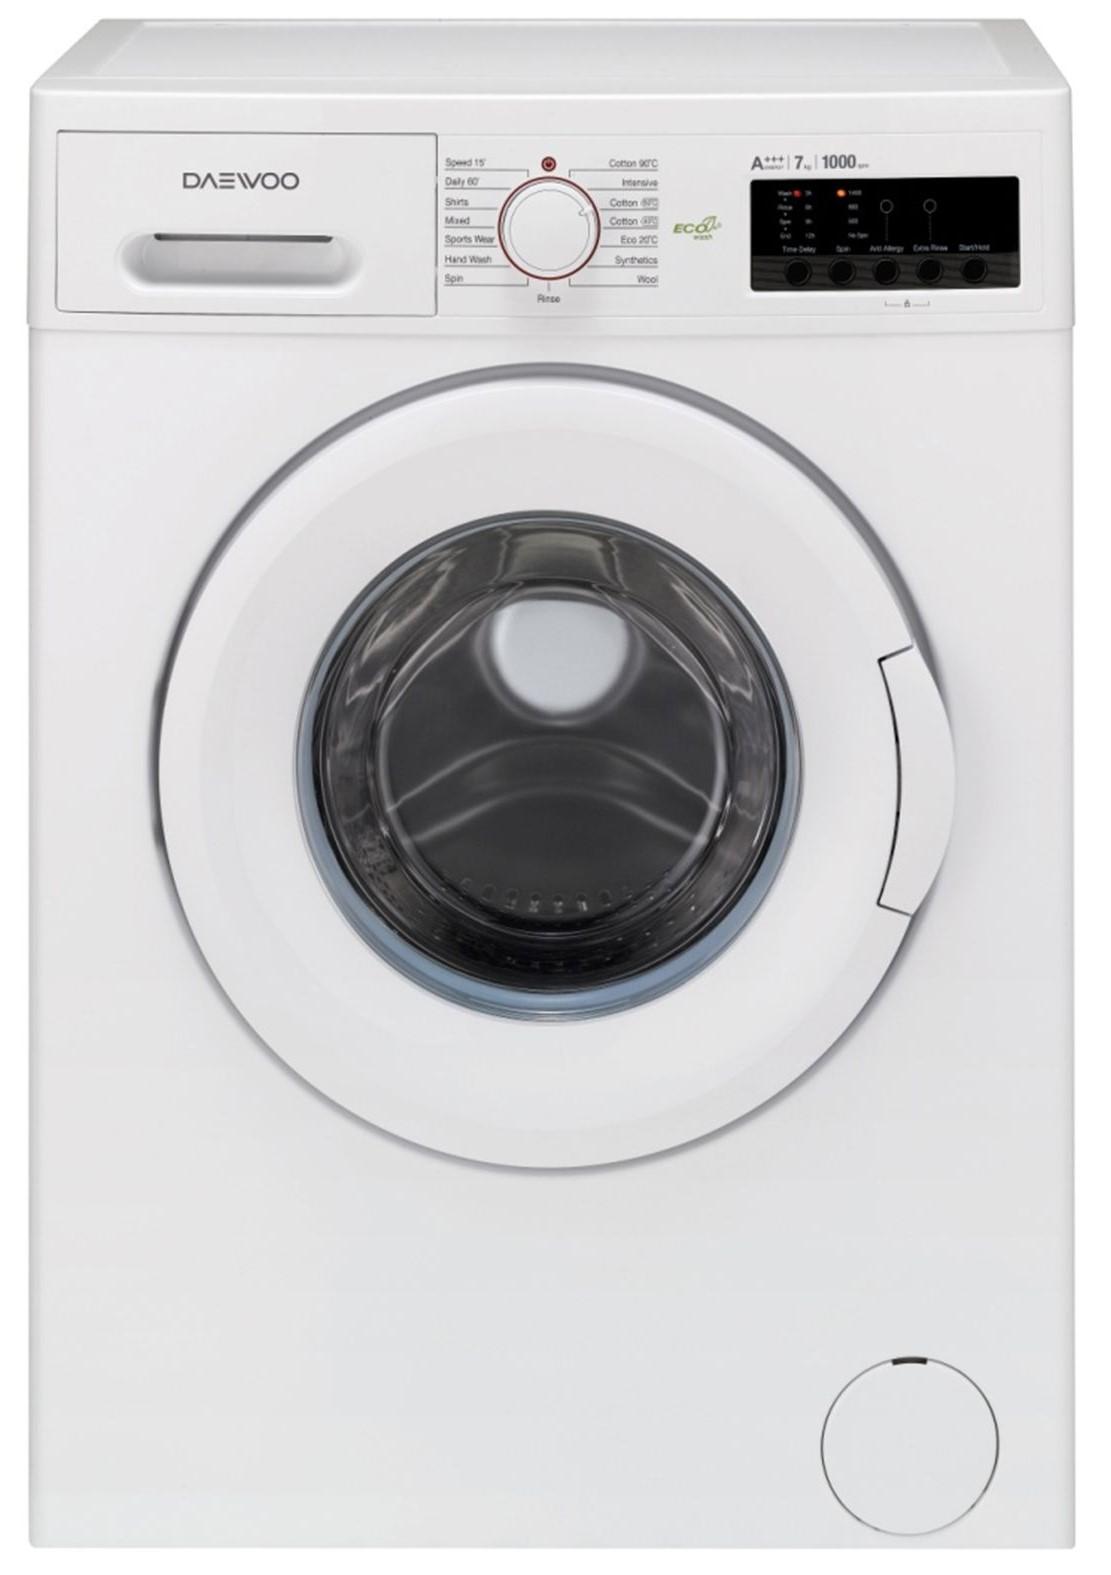 Masina de spalat rufe Daewoo DWDFV2021, 7kg, 1000rpm